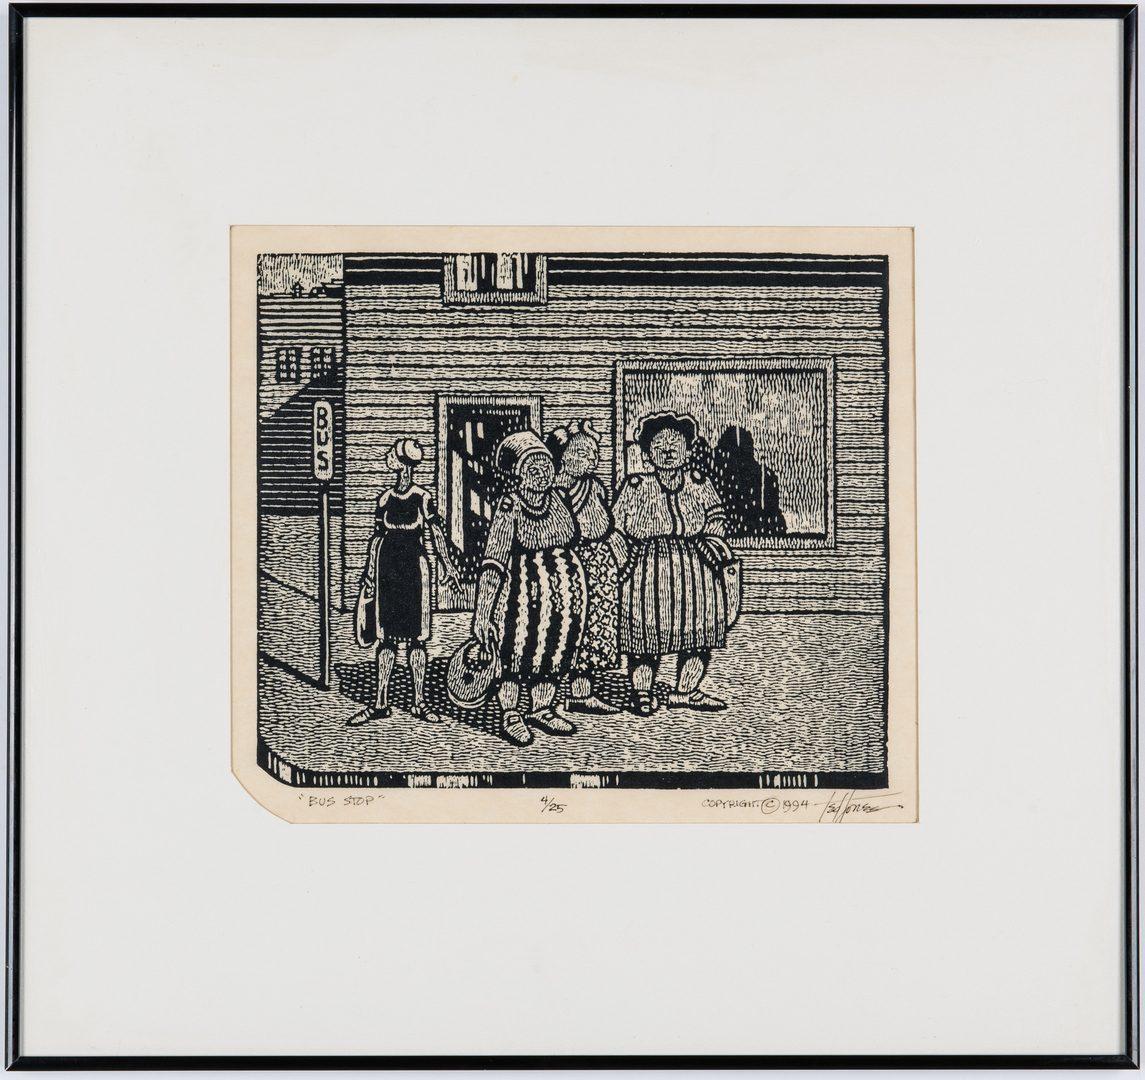 Lot 550: 2 Prints: Red Grooms & Ted Jones